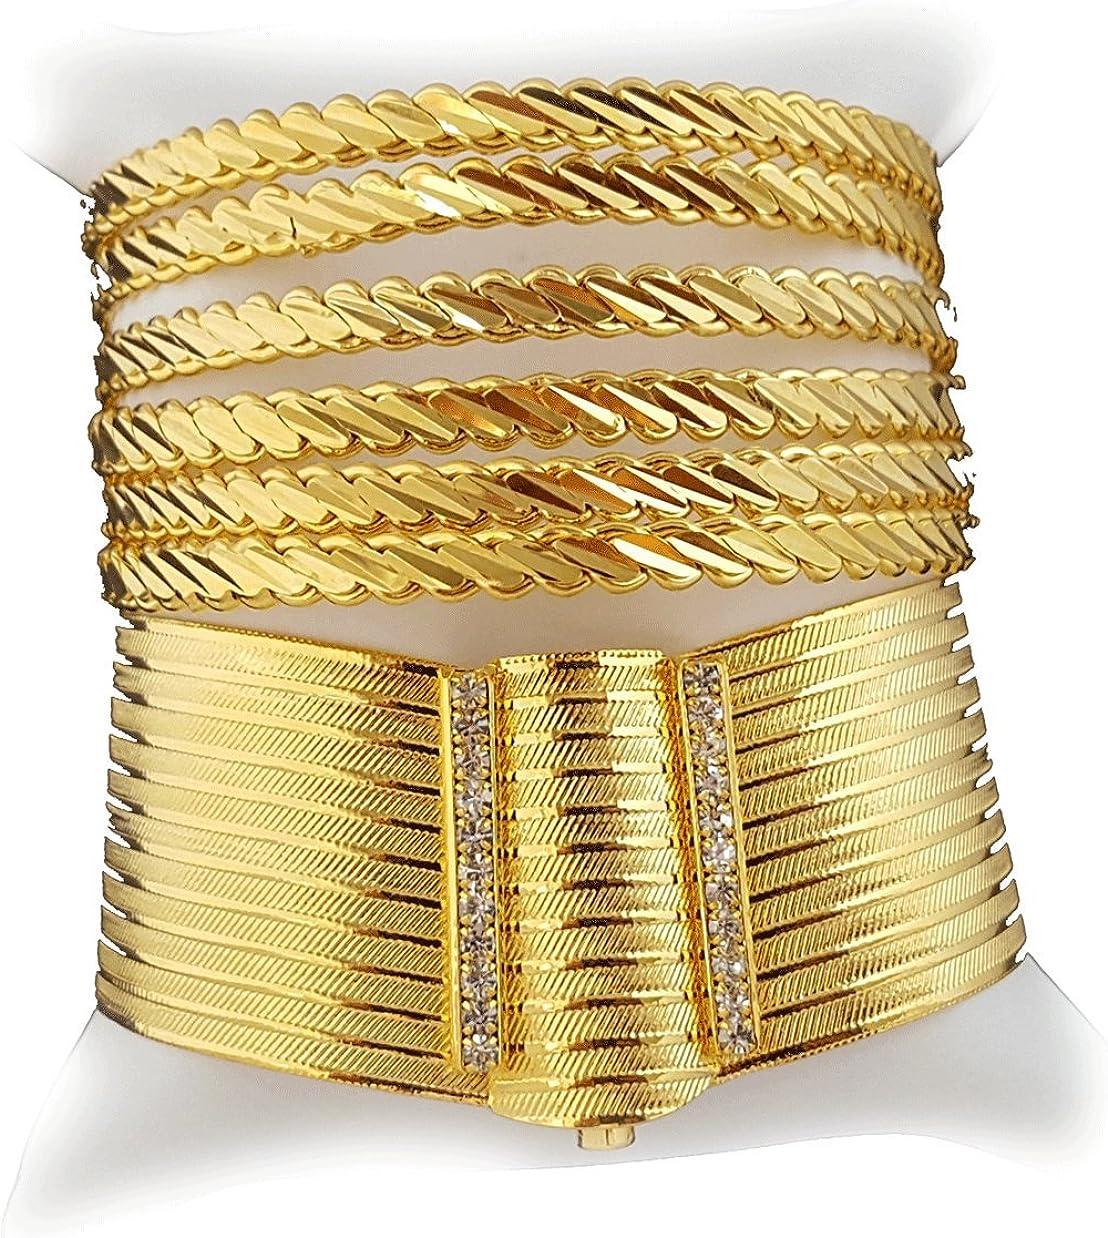 Altin Kaplama Trabzon Bilezik Bilekik 24 Karat Gold GP Armreif Armreifen 3 cm